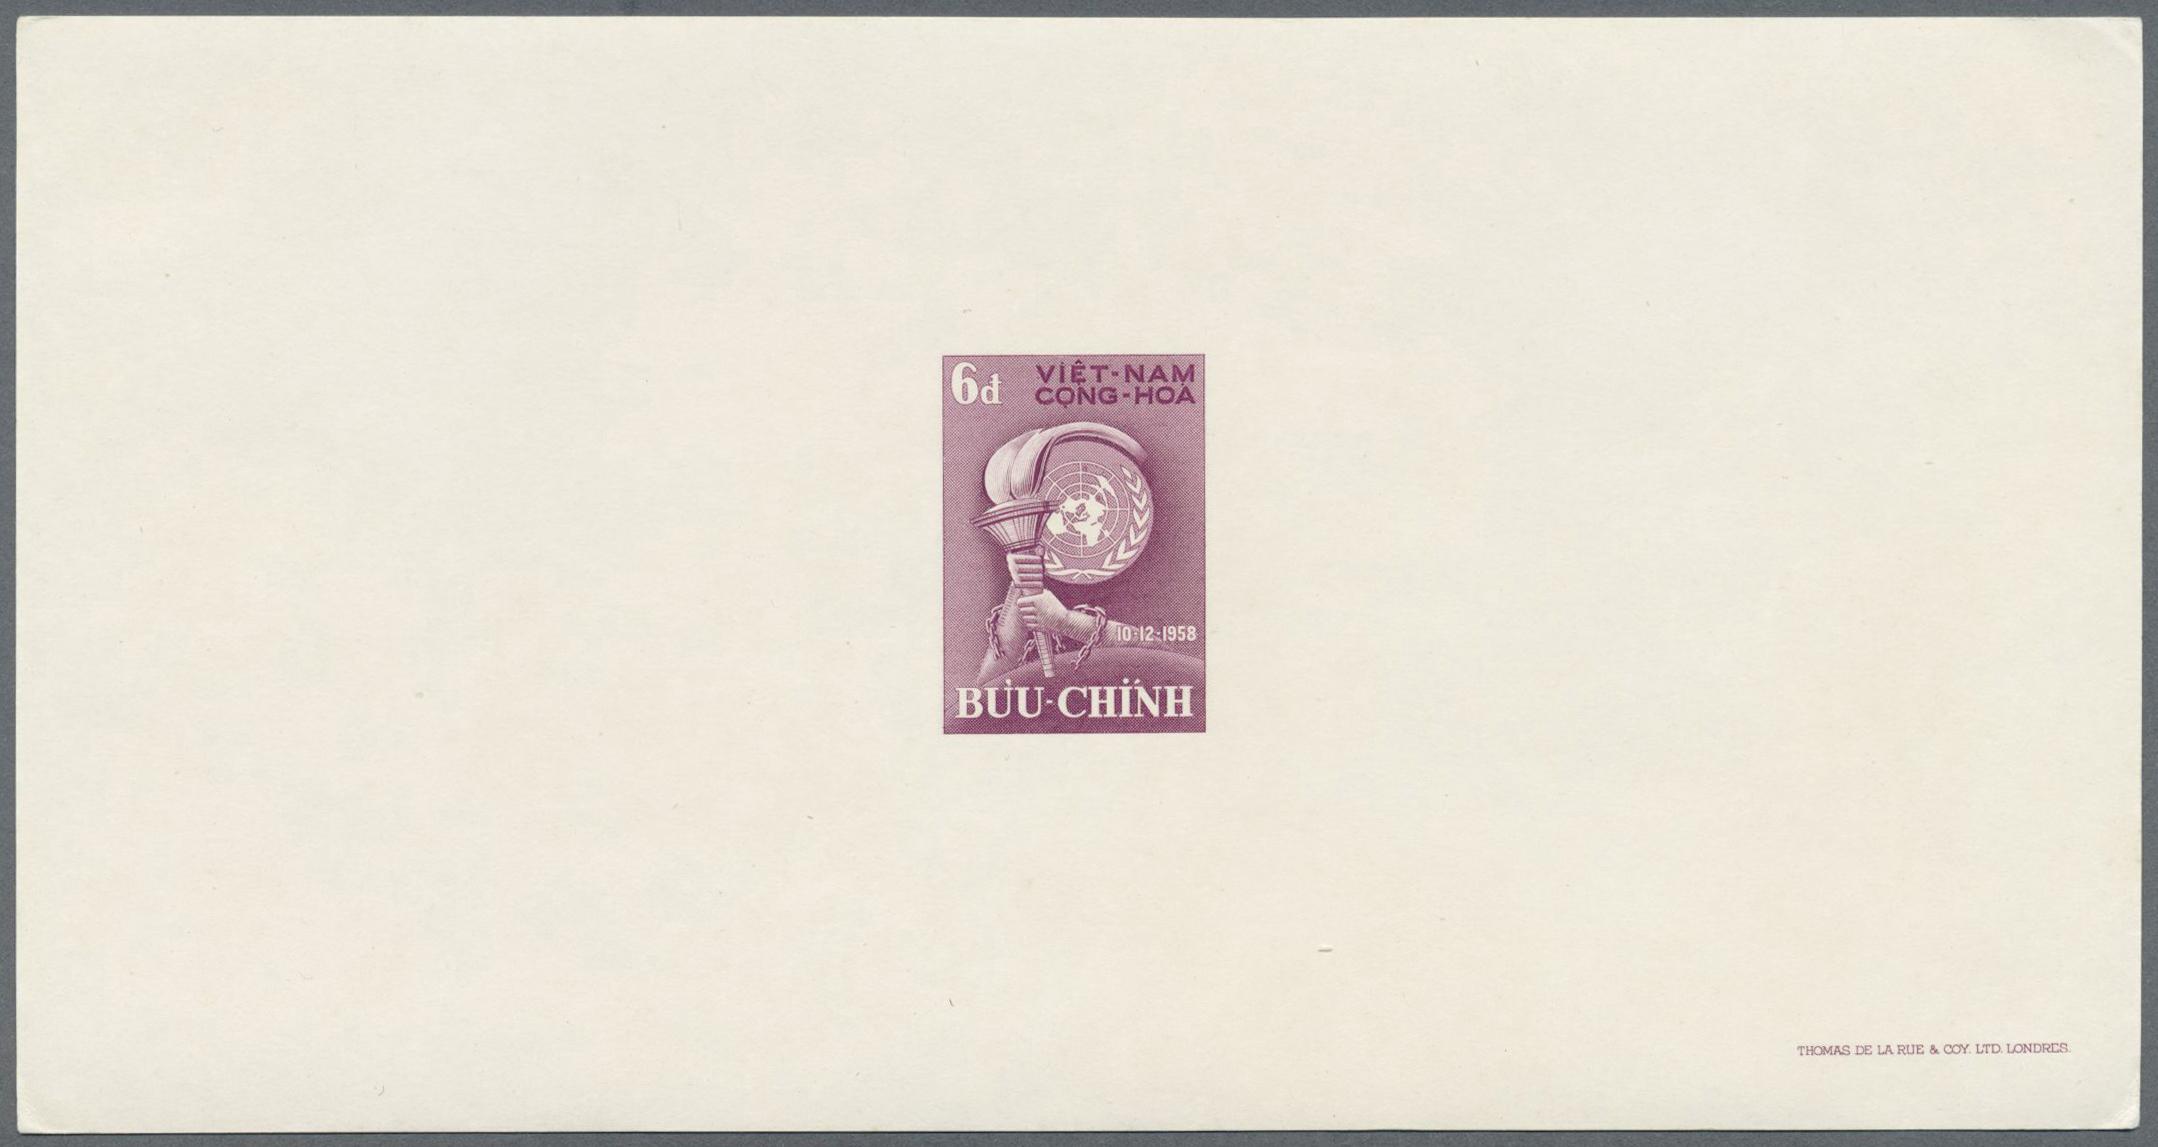 Lot 8242 - Vietnam - Besonderheiten  -  Auktionshaus Christoph Gärtner GmbH & Co. KG Philately: ASIA single lots including Special Catalog Malaya Auction #39 Day 3